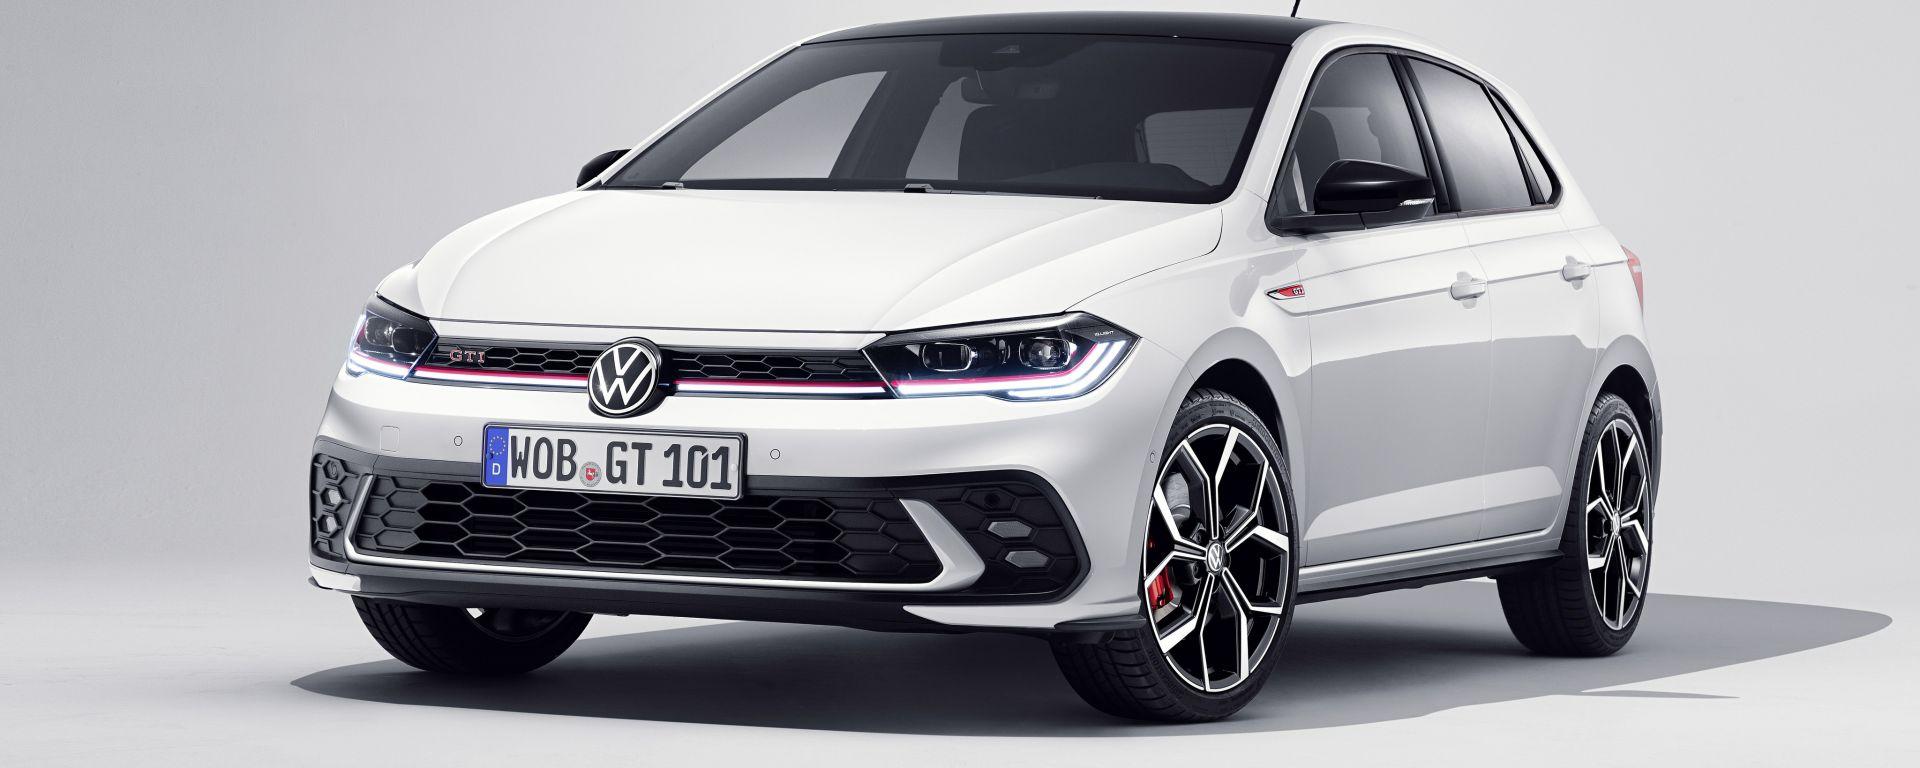 Nuova Volkswagen Polo GTI 2021